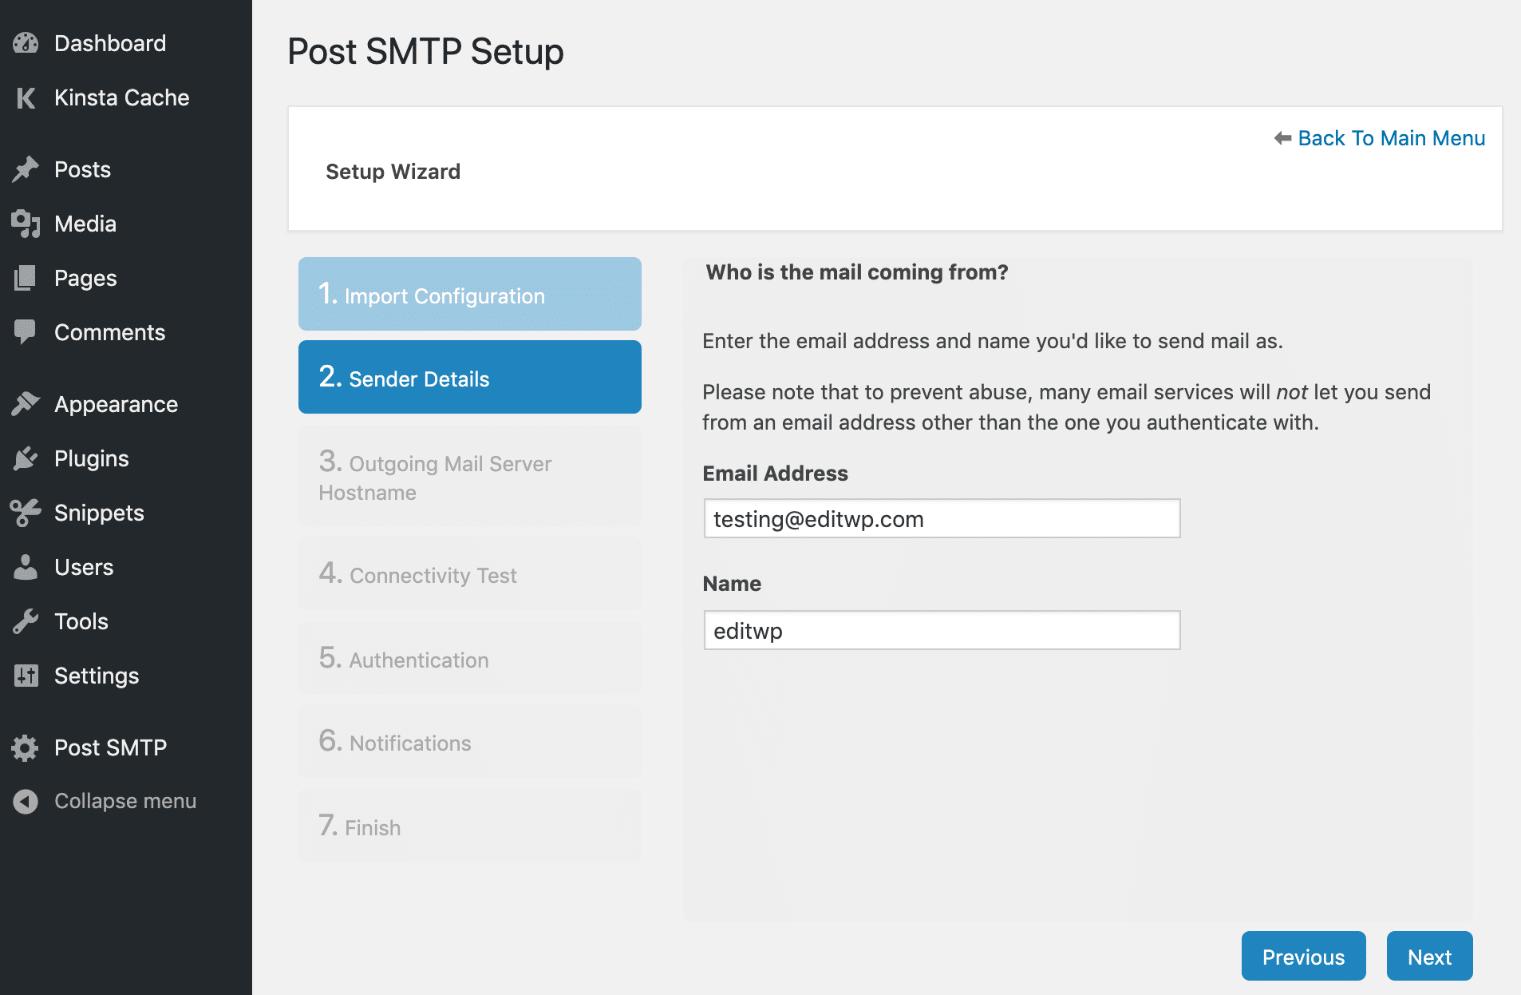 Post SMTPの送信元情報